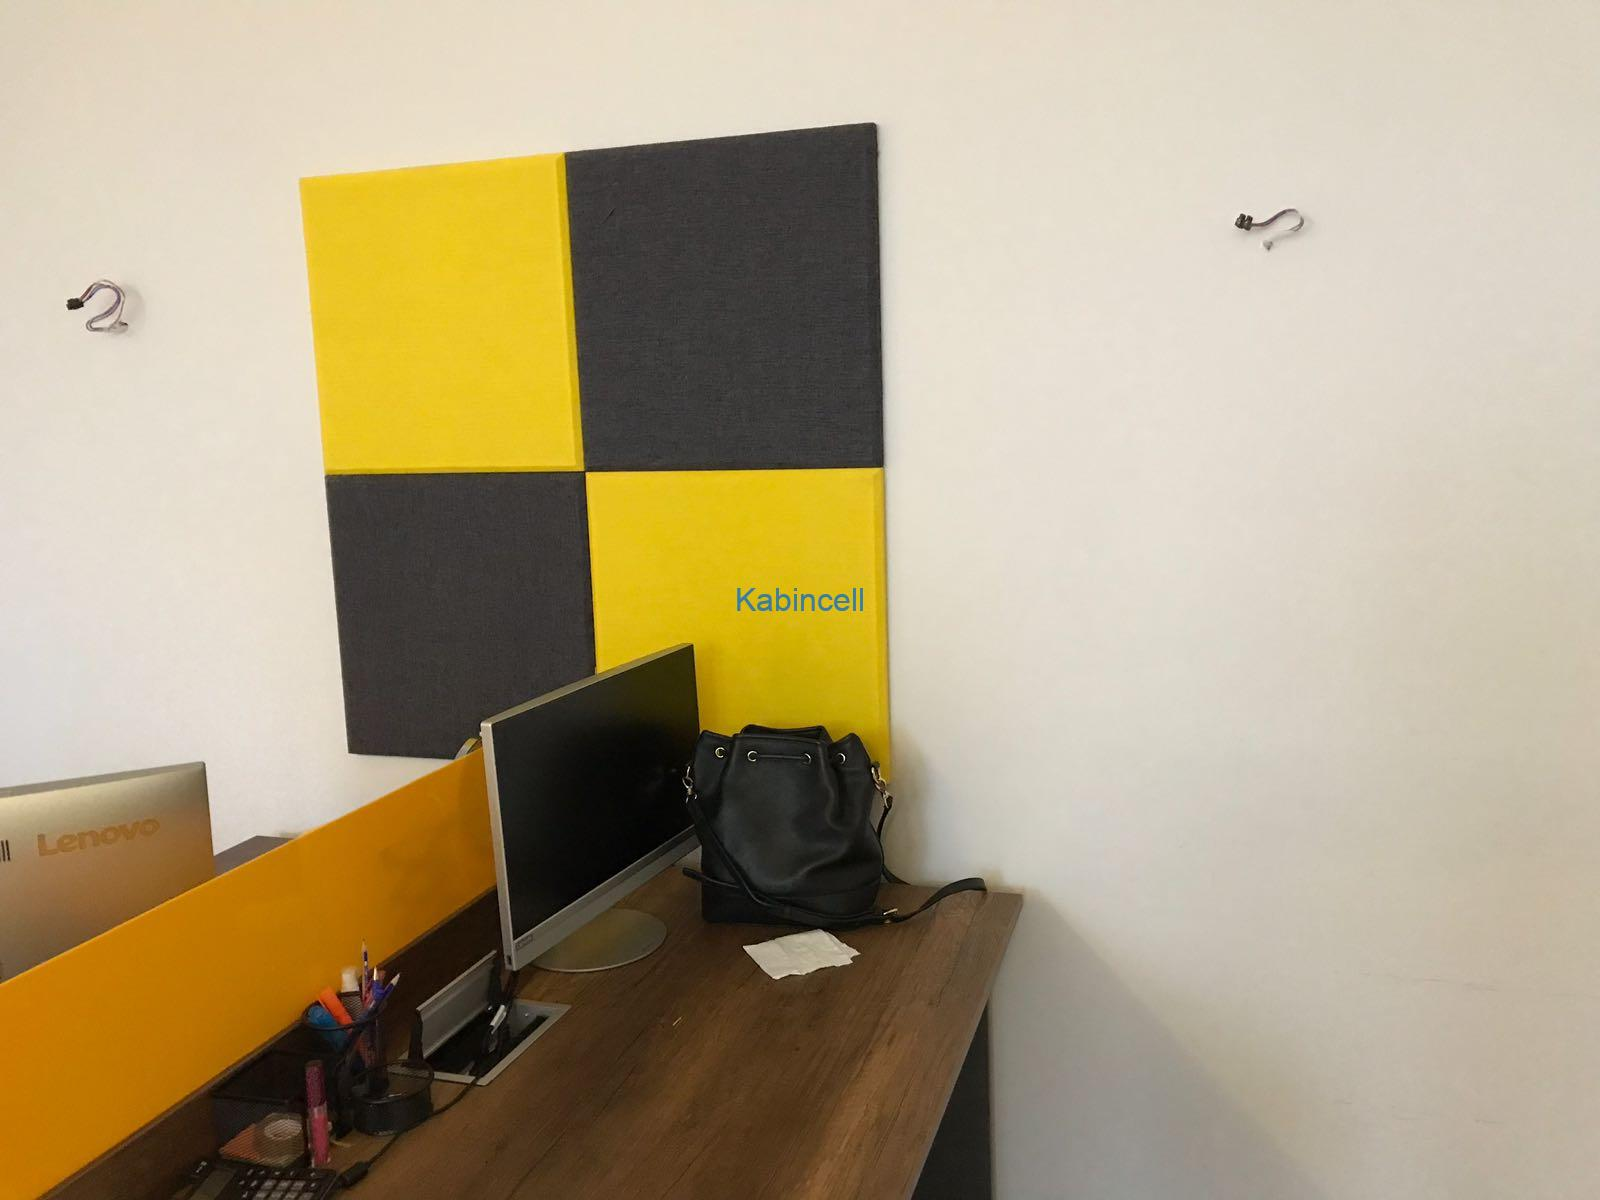 ofis-akustik-panel-kaplama-ses-ve-yanki-yalitimi6